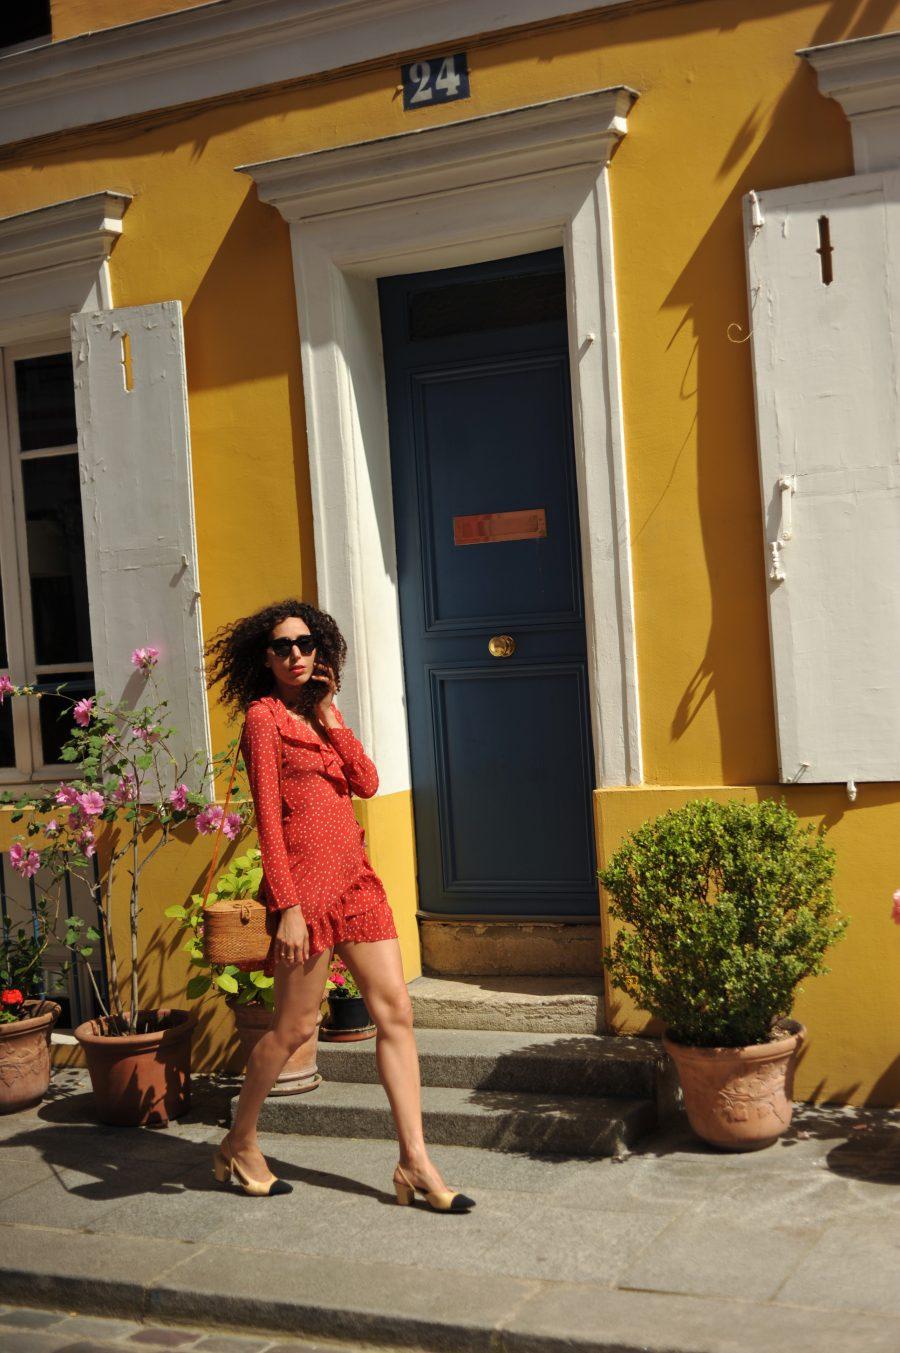 la-petite-robe-rouge-paris-11